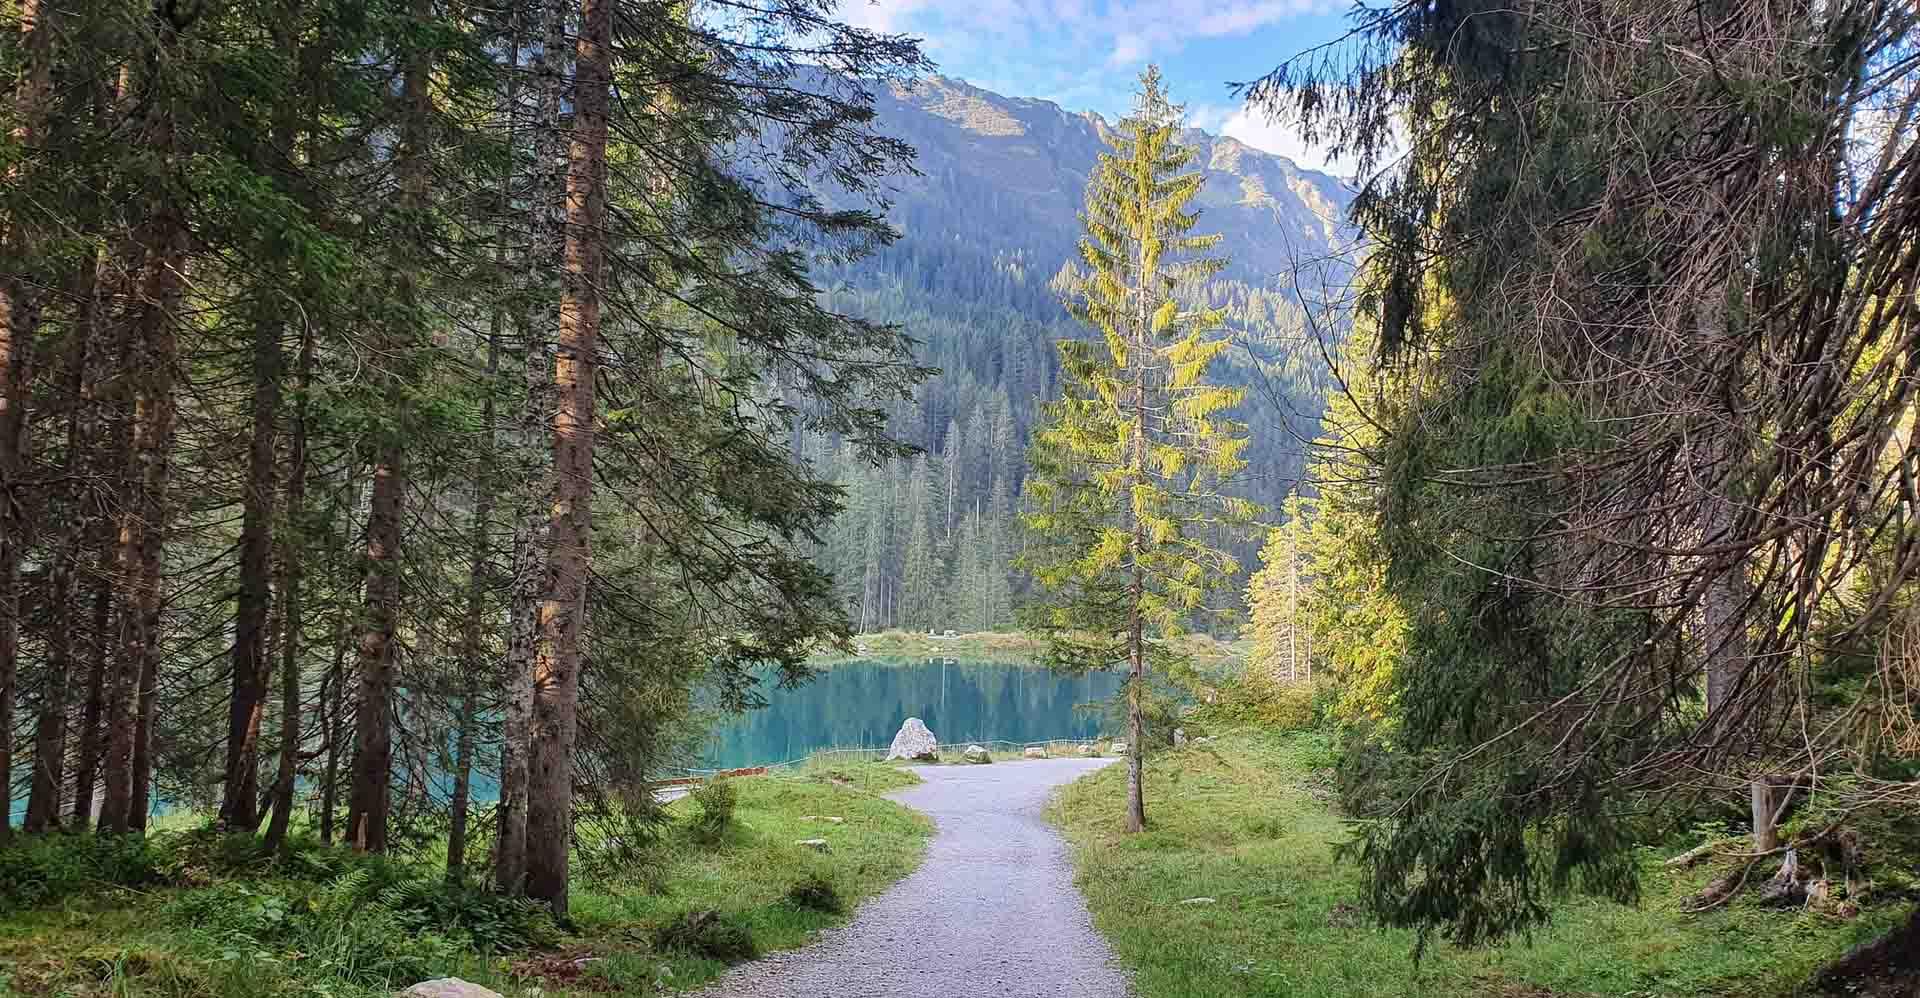 kleinwalsertal turismo sostenibile in austria